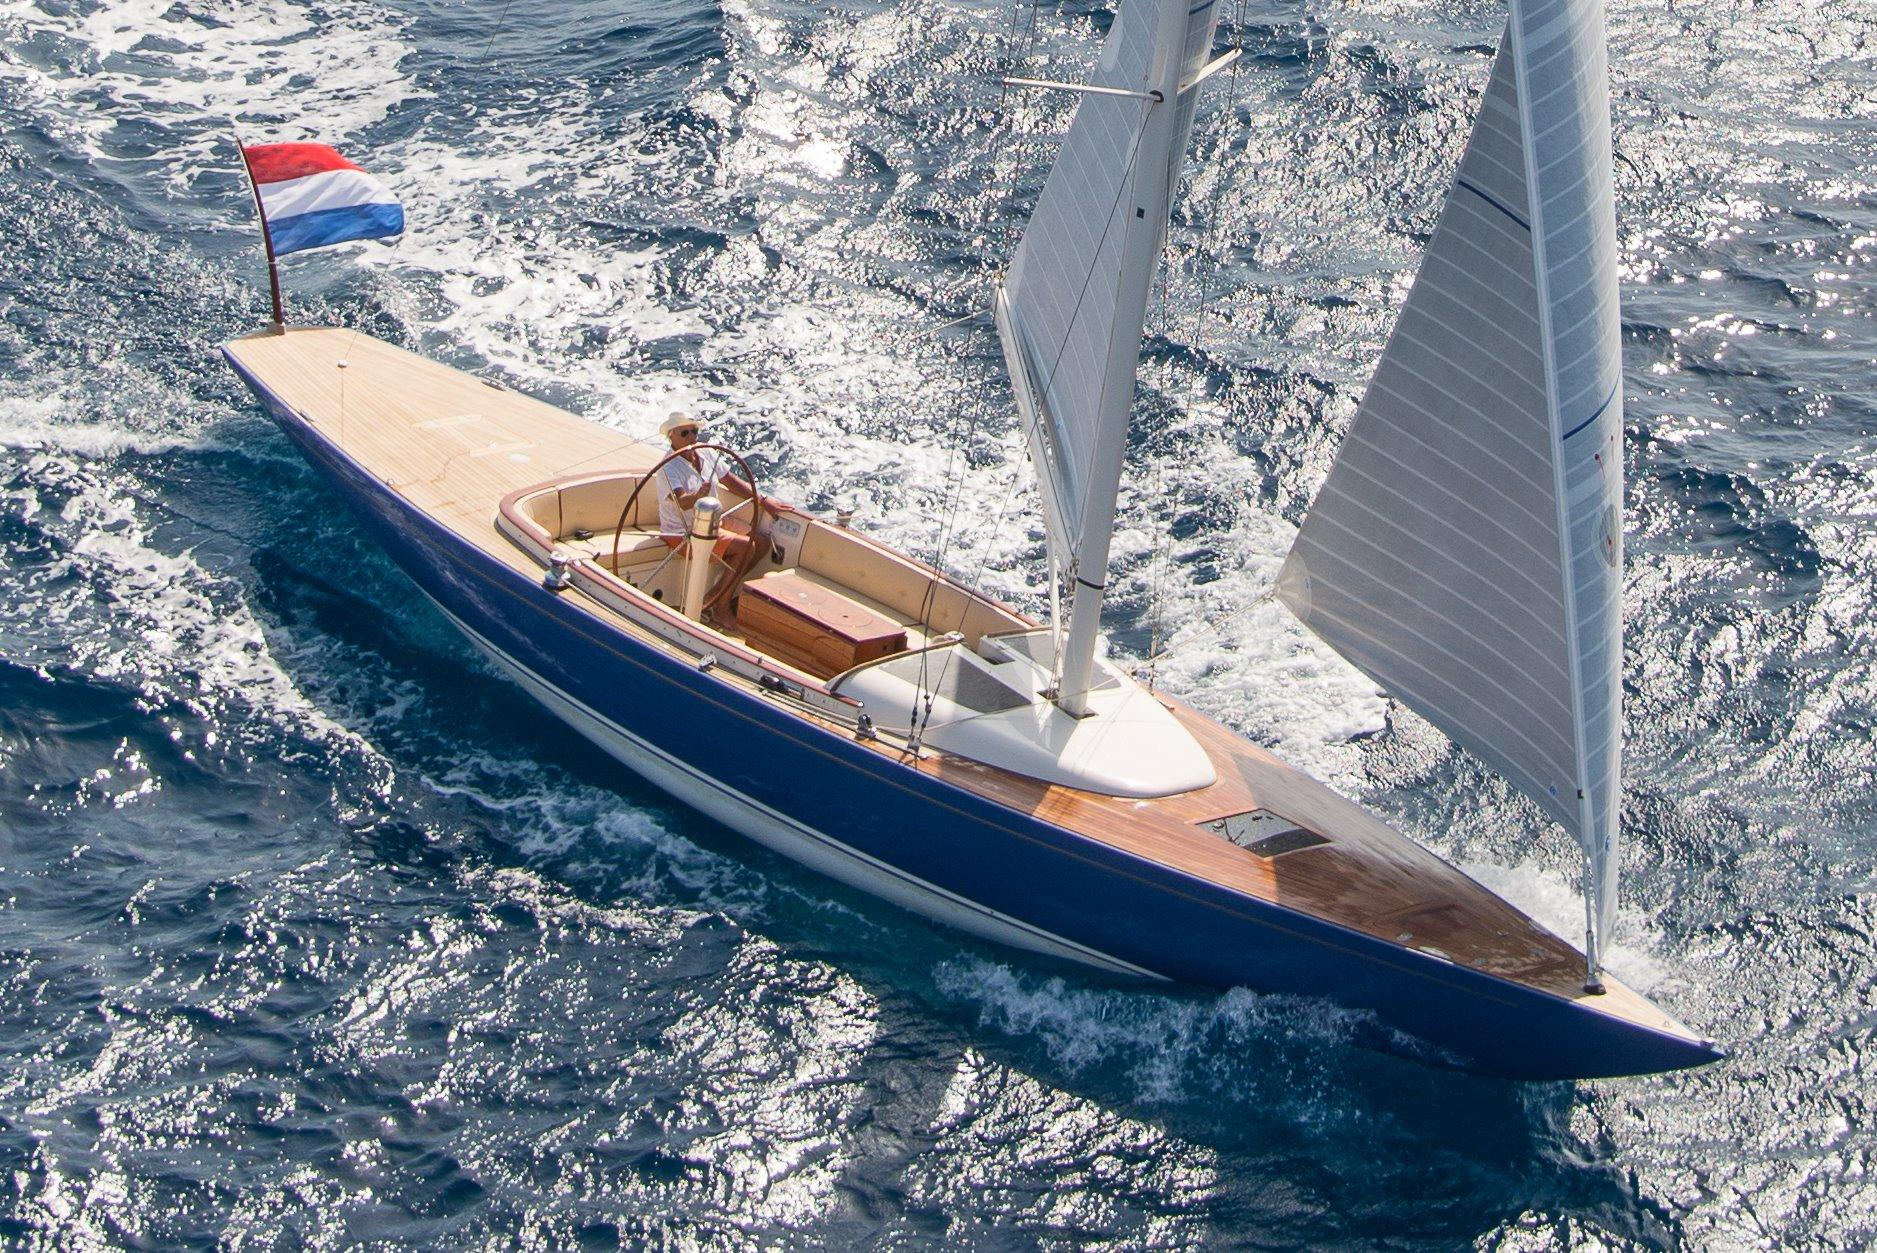 2015 Leonardo Yachts Eagle 44 Sail Boat For Sale Www